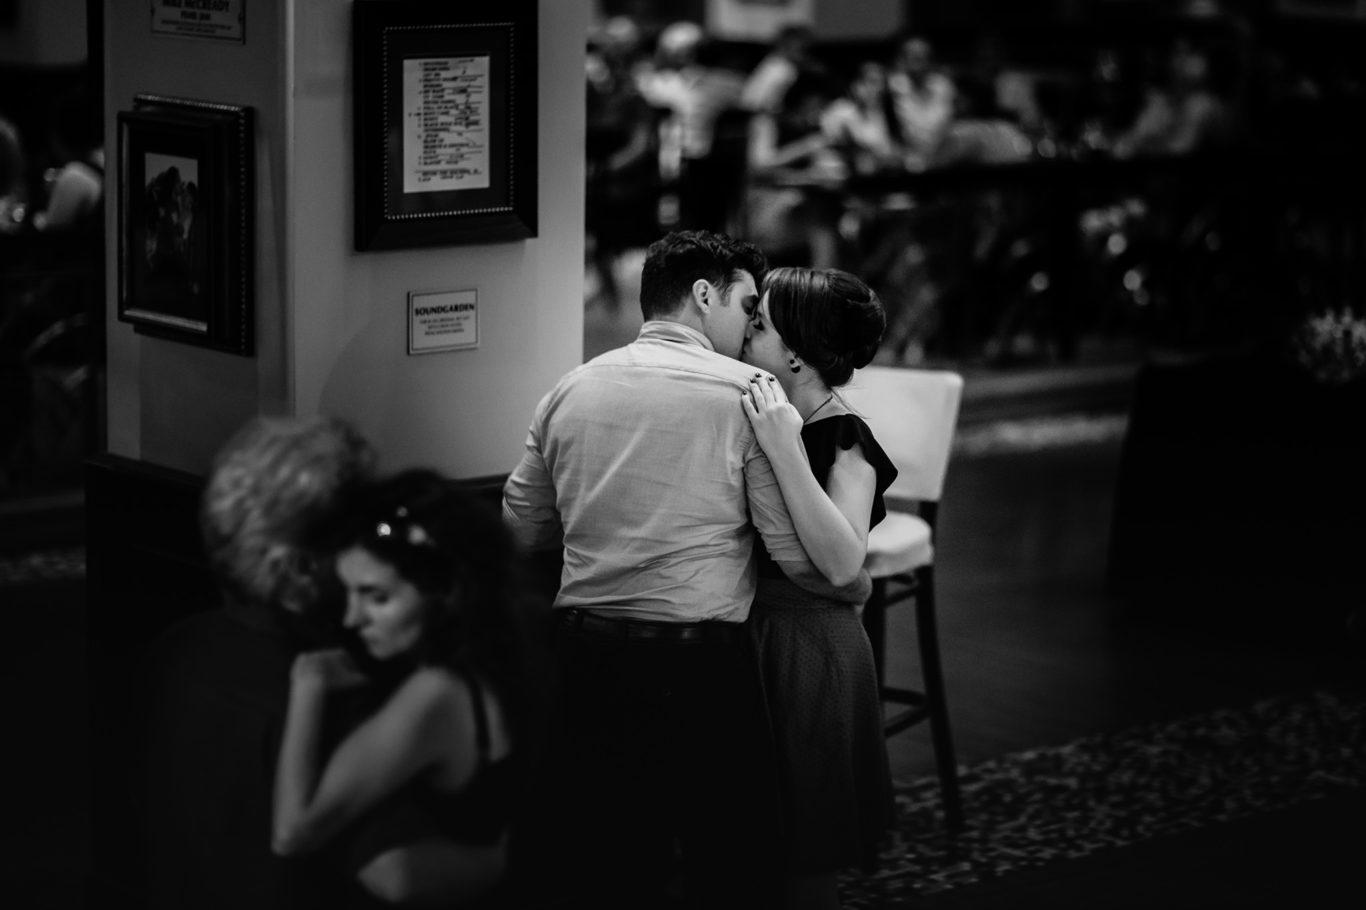 0762-fotografie-nunta-bucuresti-rodica-rares-fotograf-ciprian-dumitrescu-cd2_0012